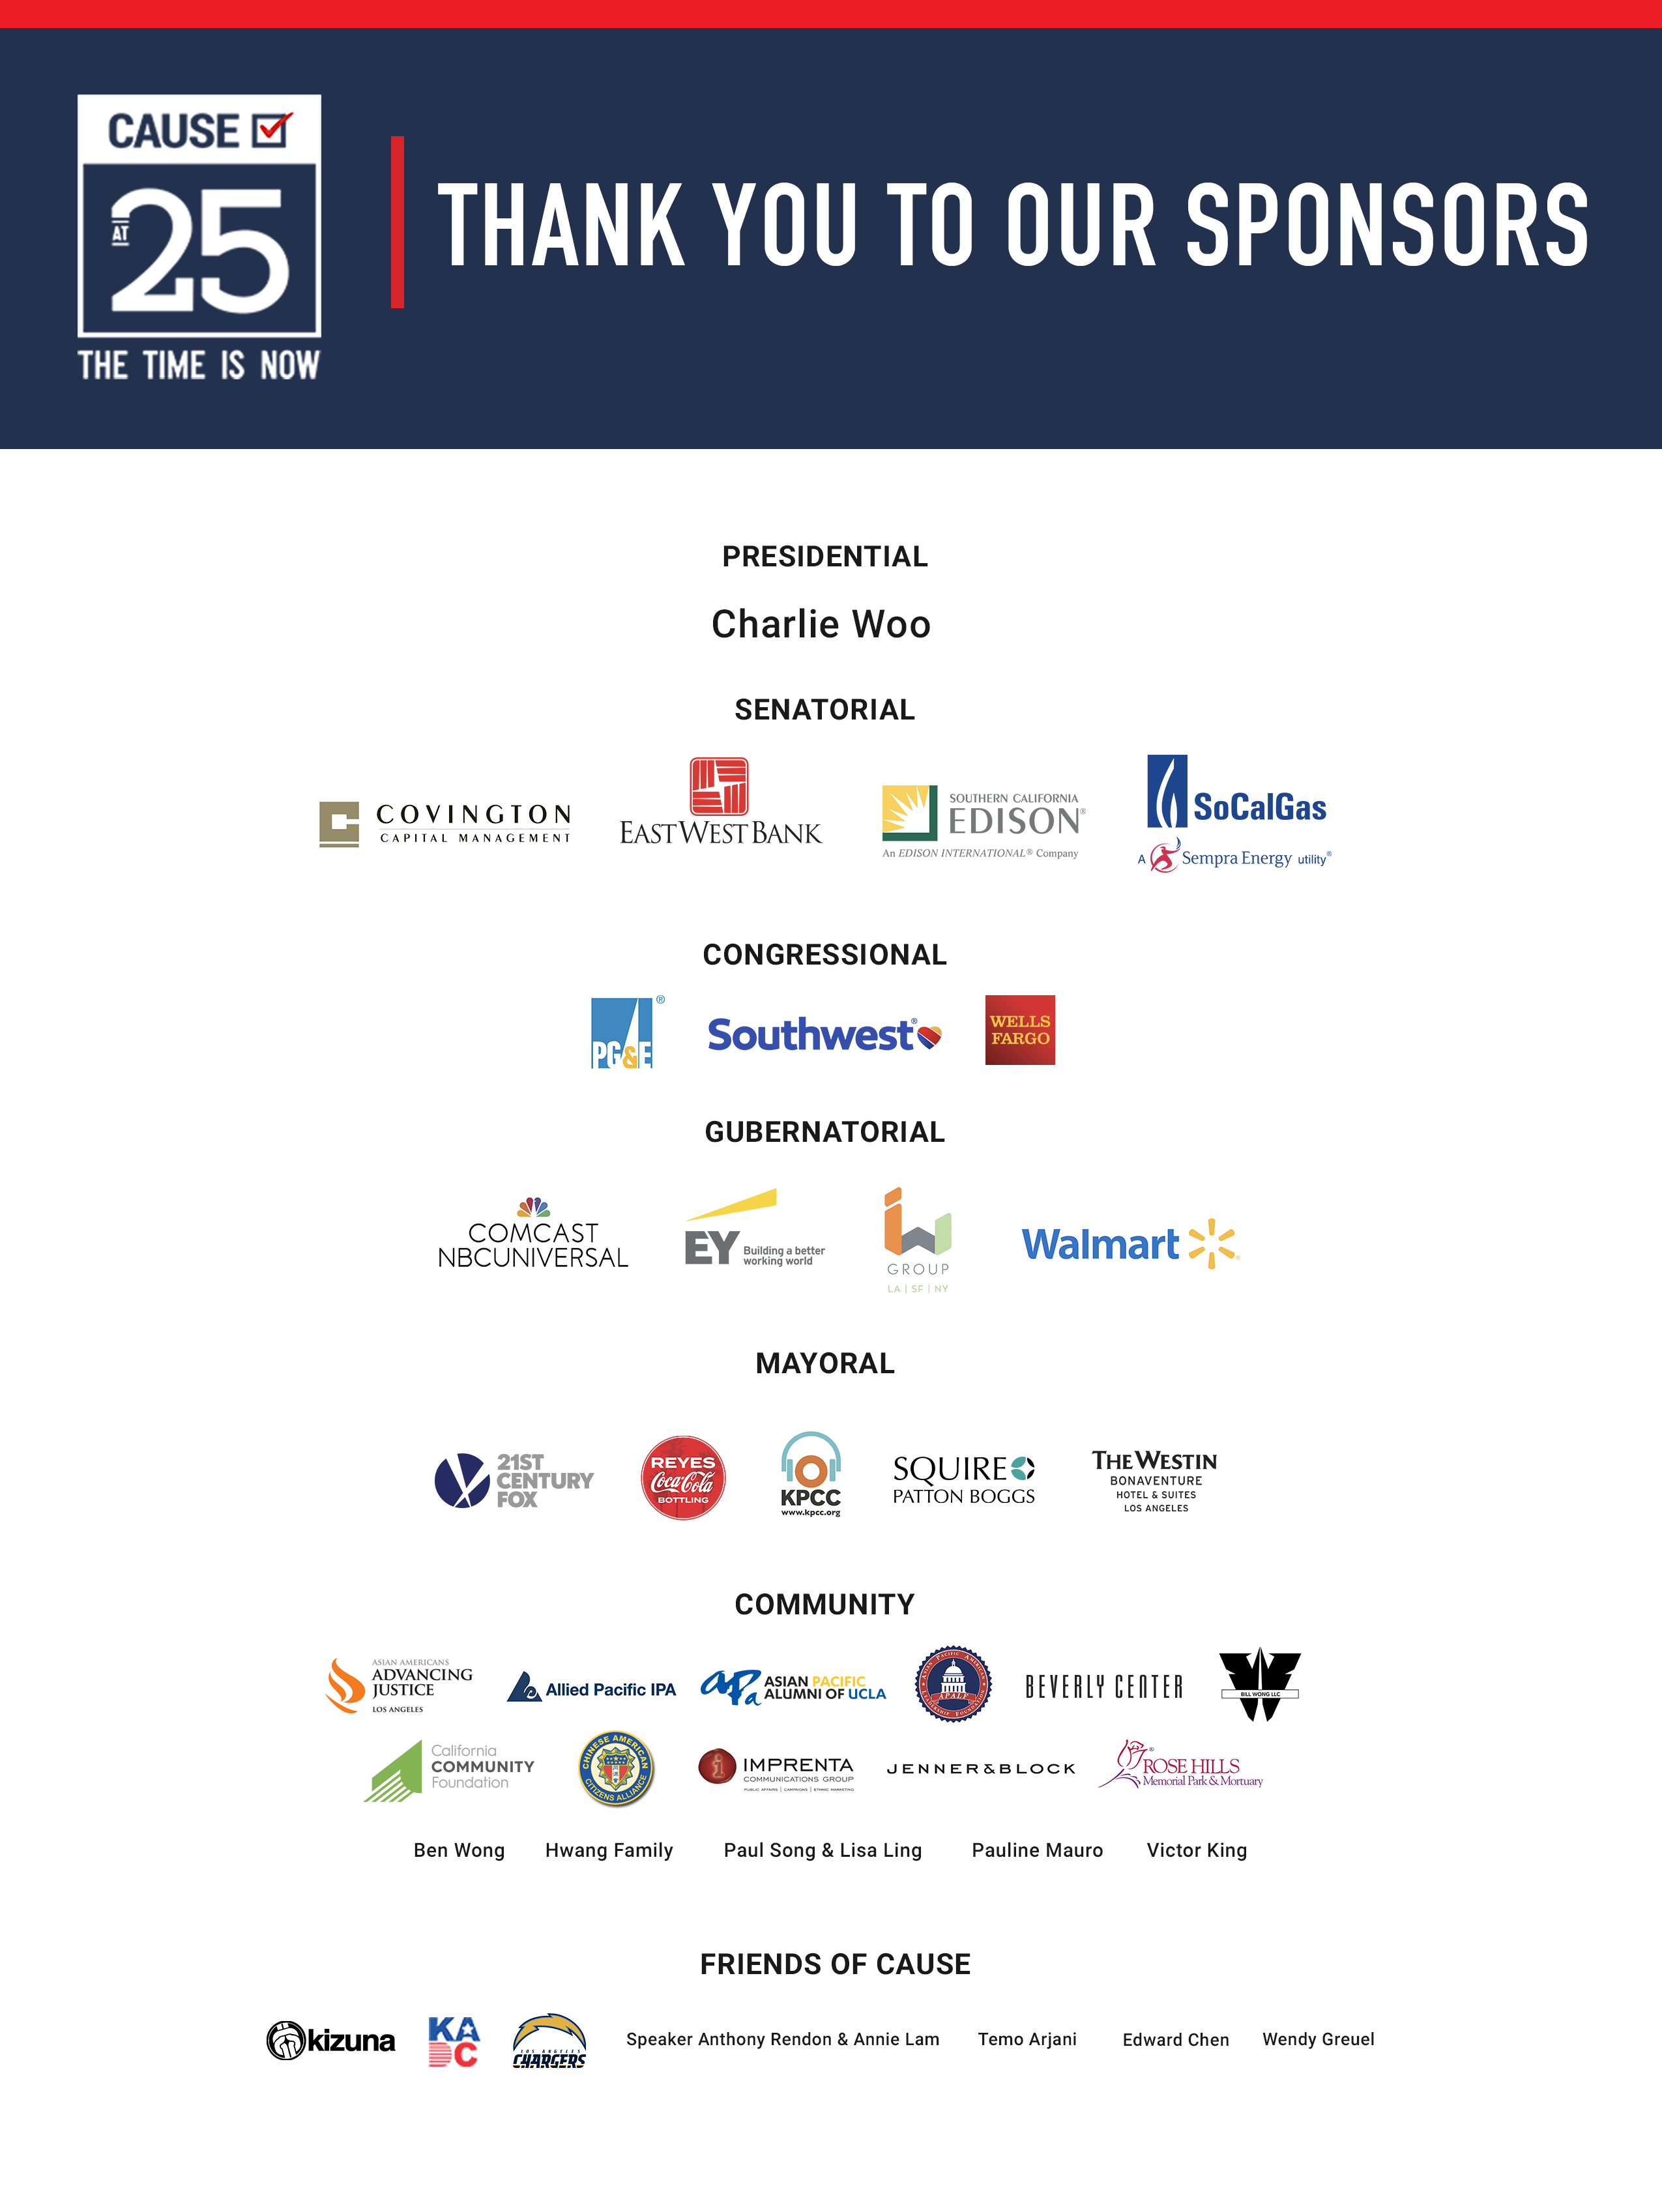 2018 Annual Gala Sponsors